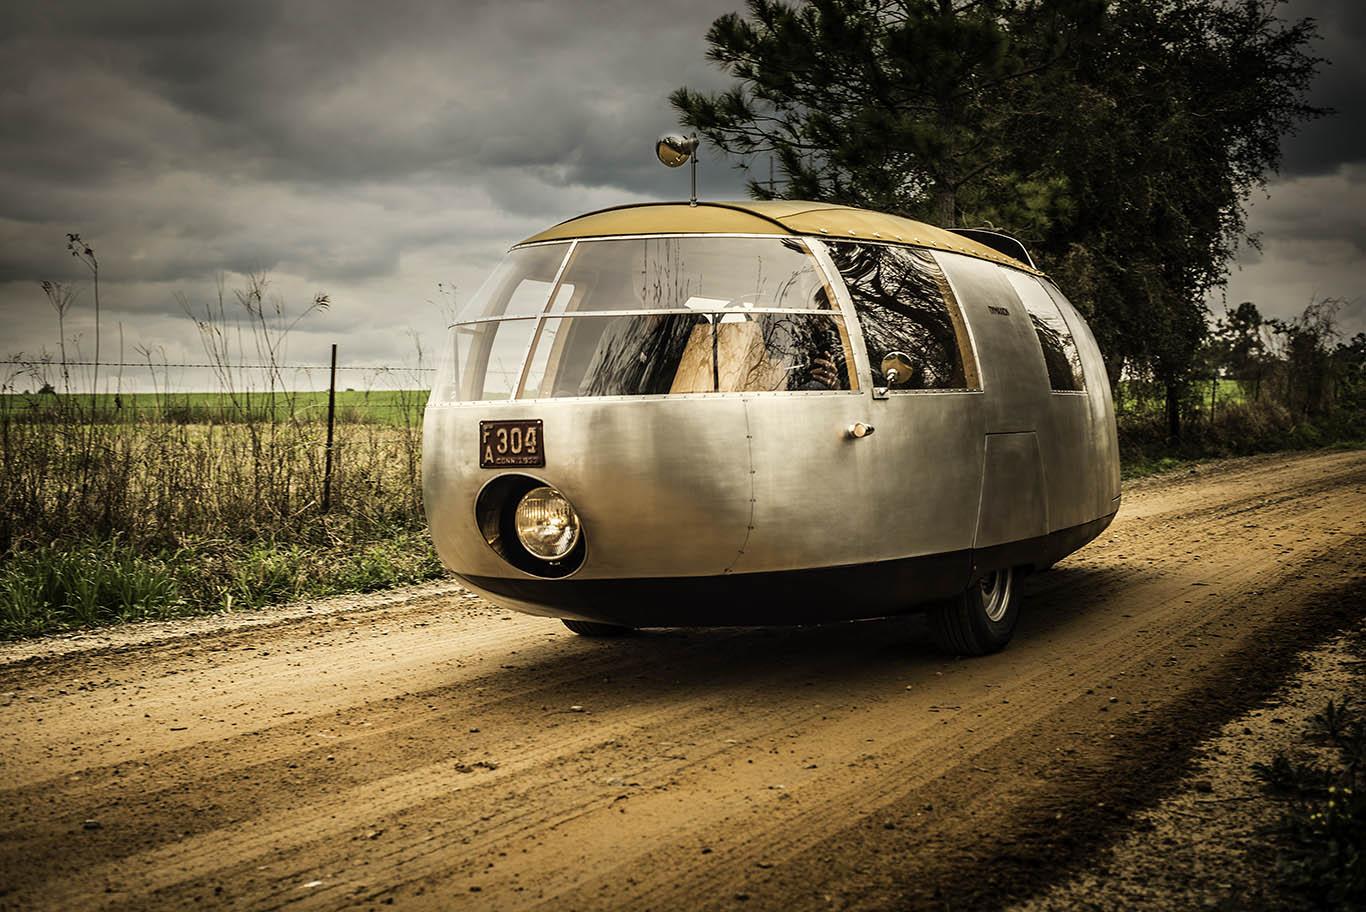 The 85th anniversary of the Dymaxion car thumbnail